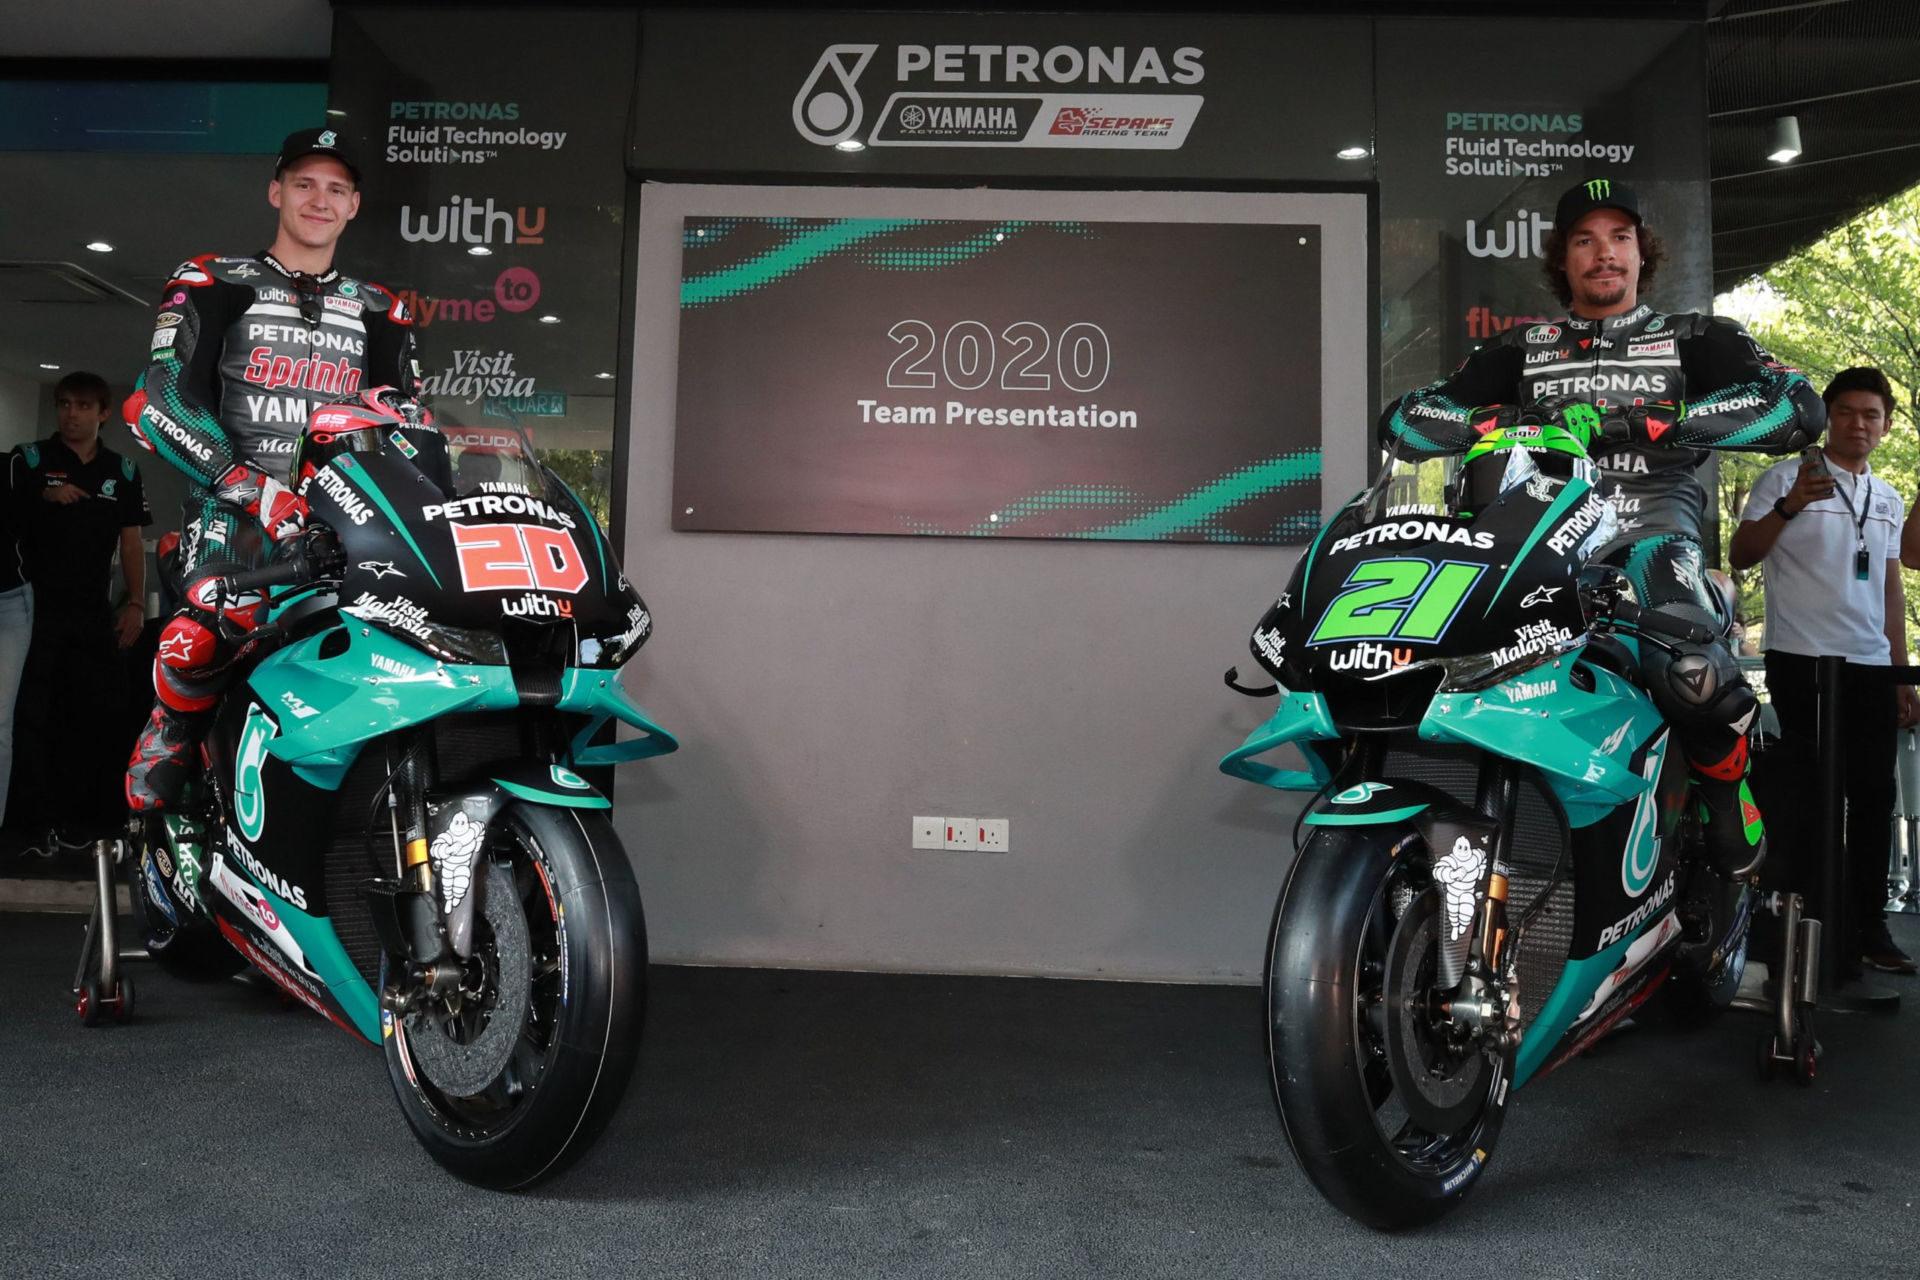 PETRONAS Yamaha Sepang Racing Team's Fabio Quartararo (left) and Franco Morbidelli (right). Photo courtesy PETRONAS Yamaha SRT.